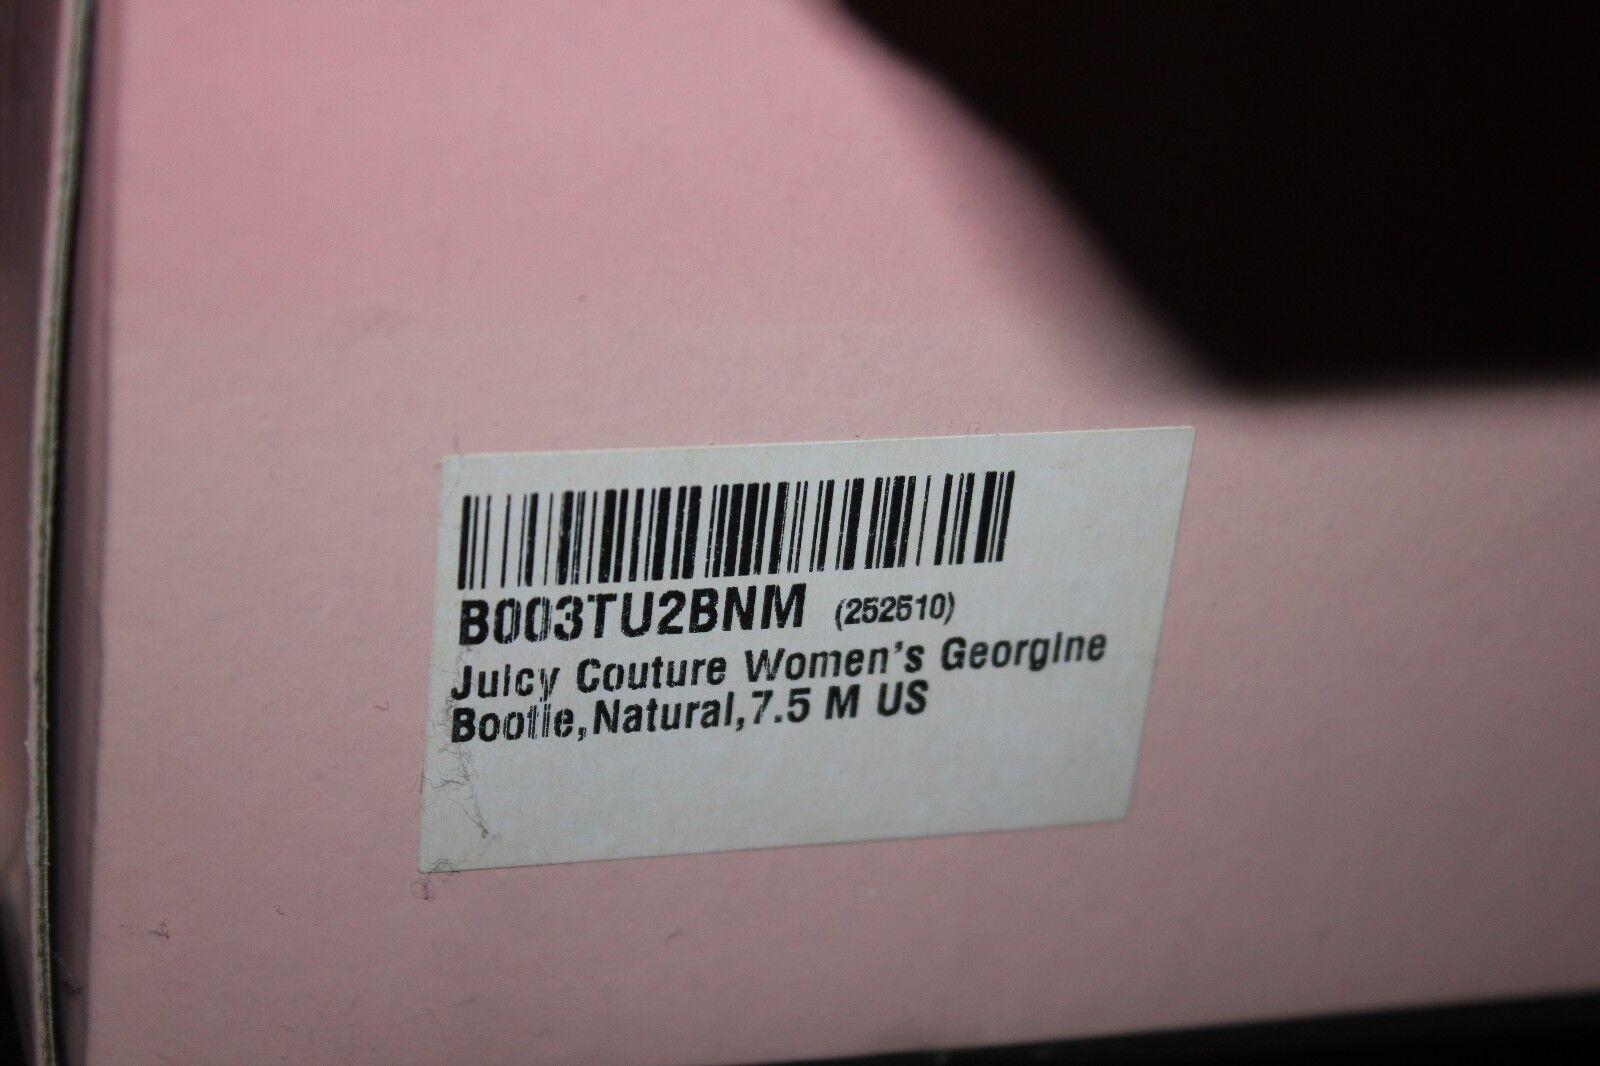 Juicy Couture Georgine Open Toe Stiefelie Heels schuhe in in in Natural Suede Größe 7.5 974d29